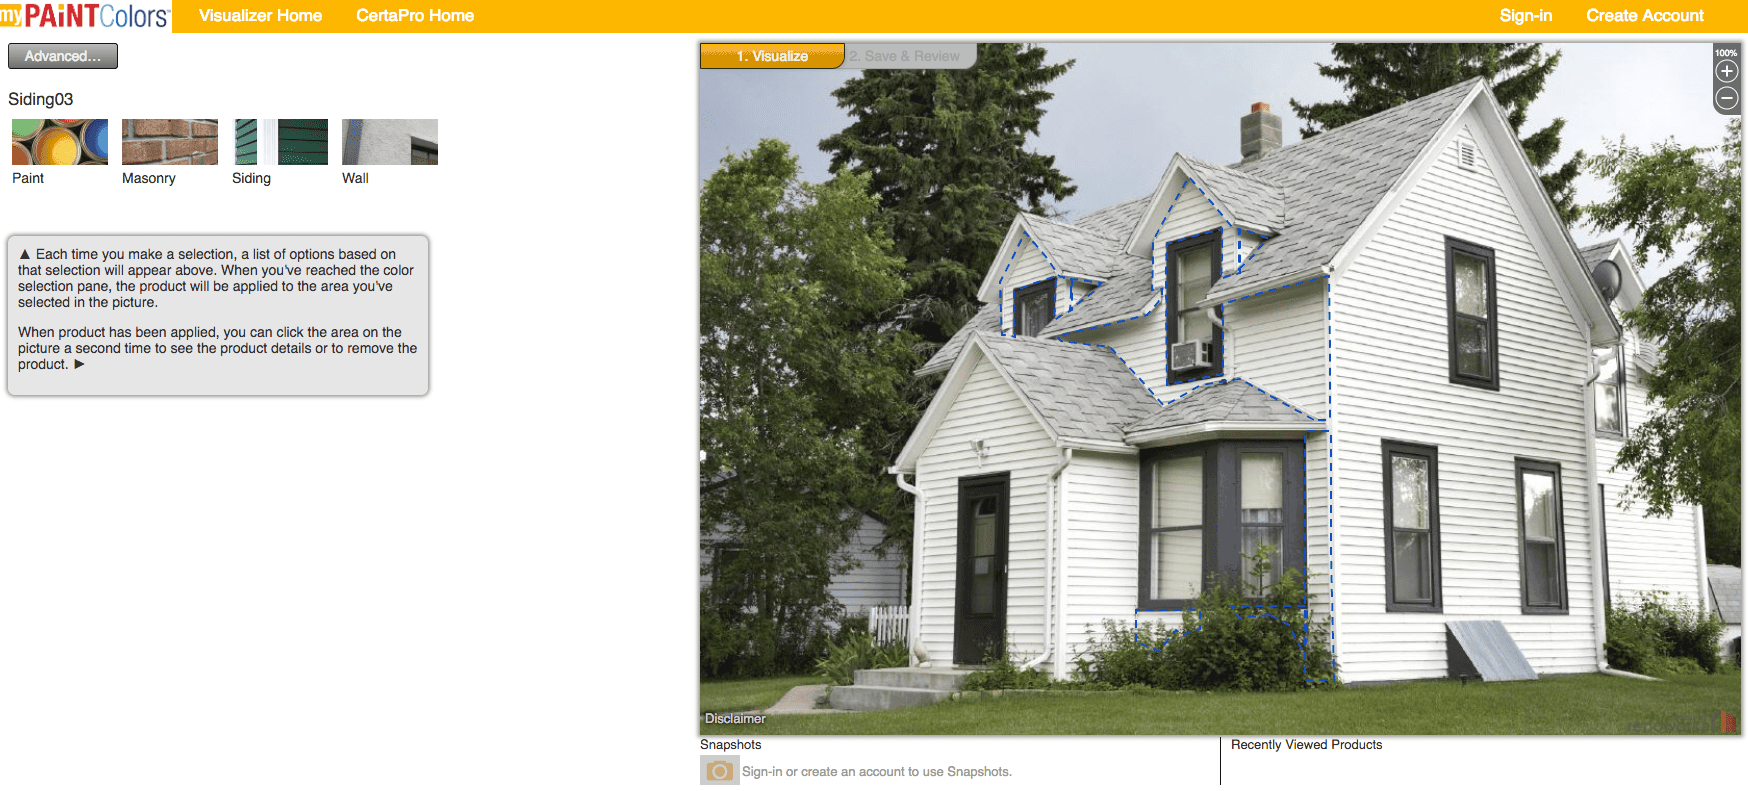 CertaPro My Paint Colors House exterior software